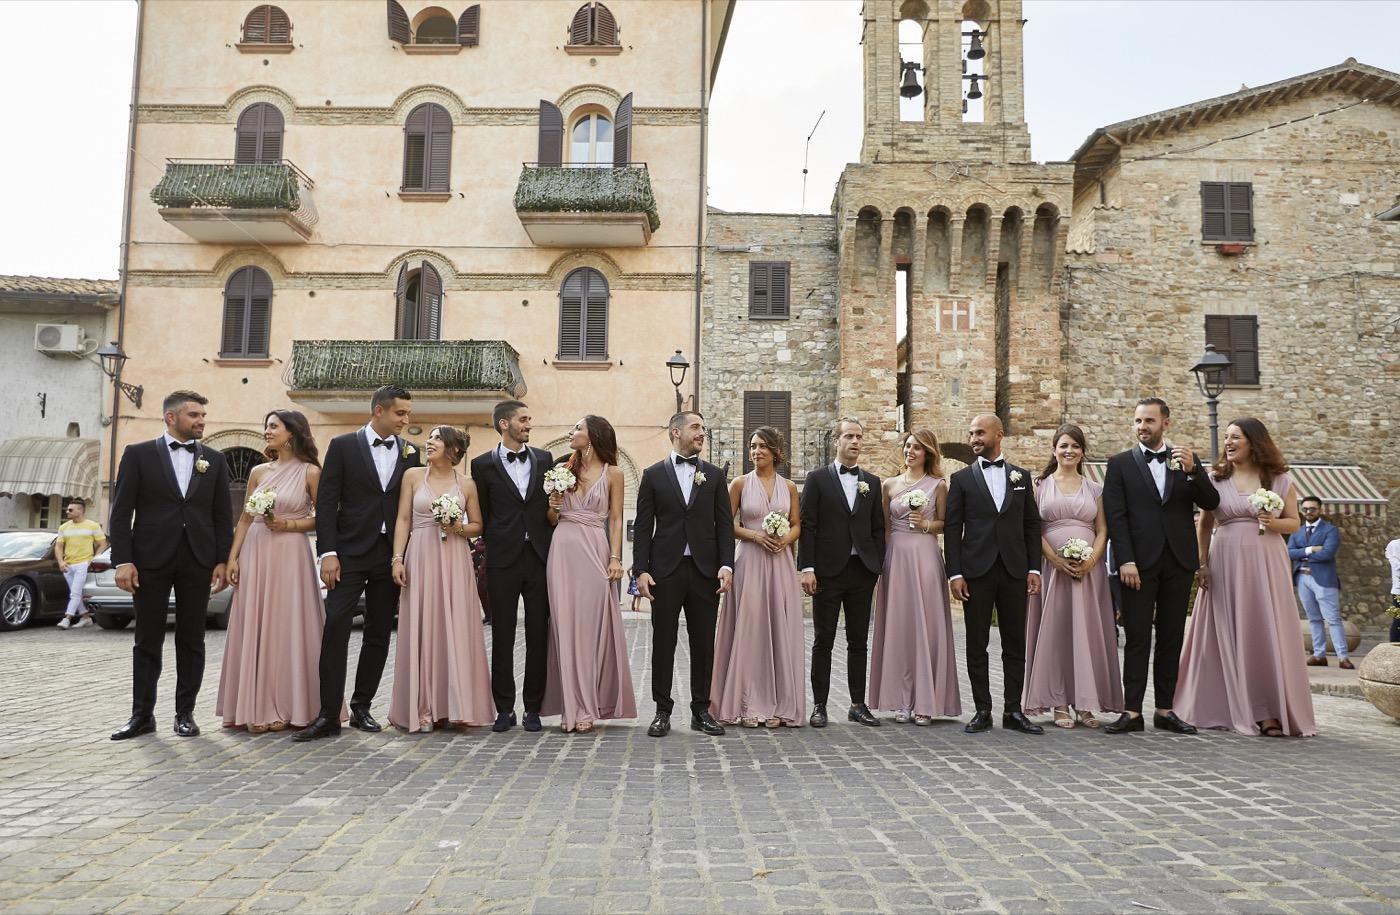 Claudio-Coppola-wedding-photographer-abbazia-7-frati-piegaro-39